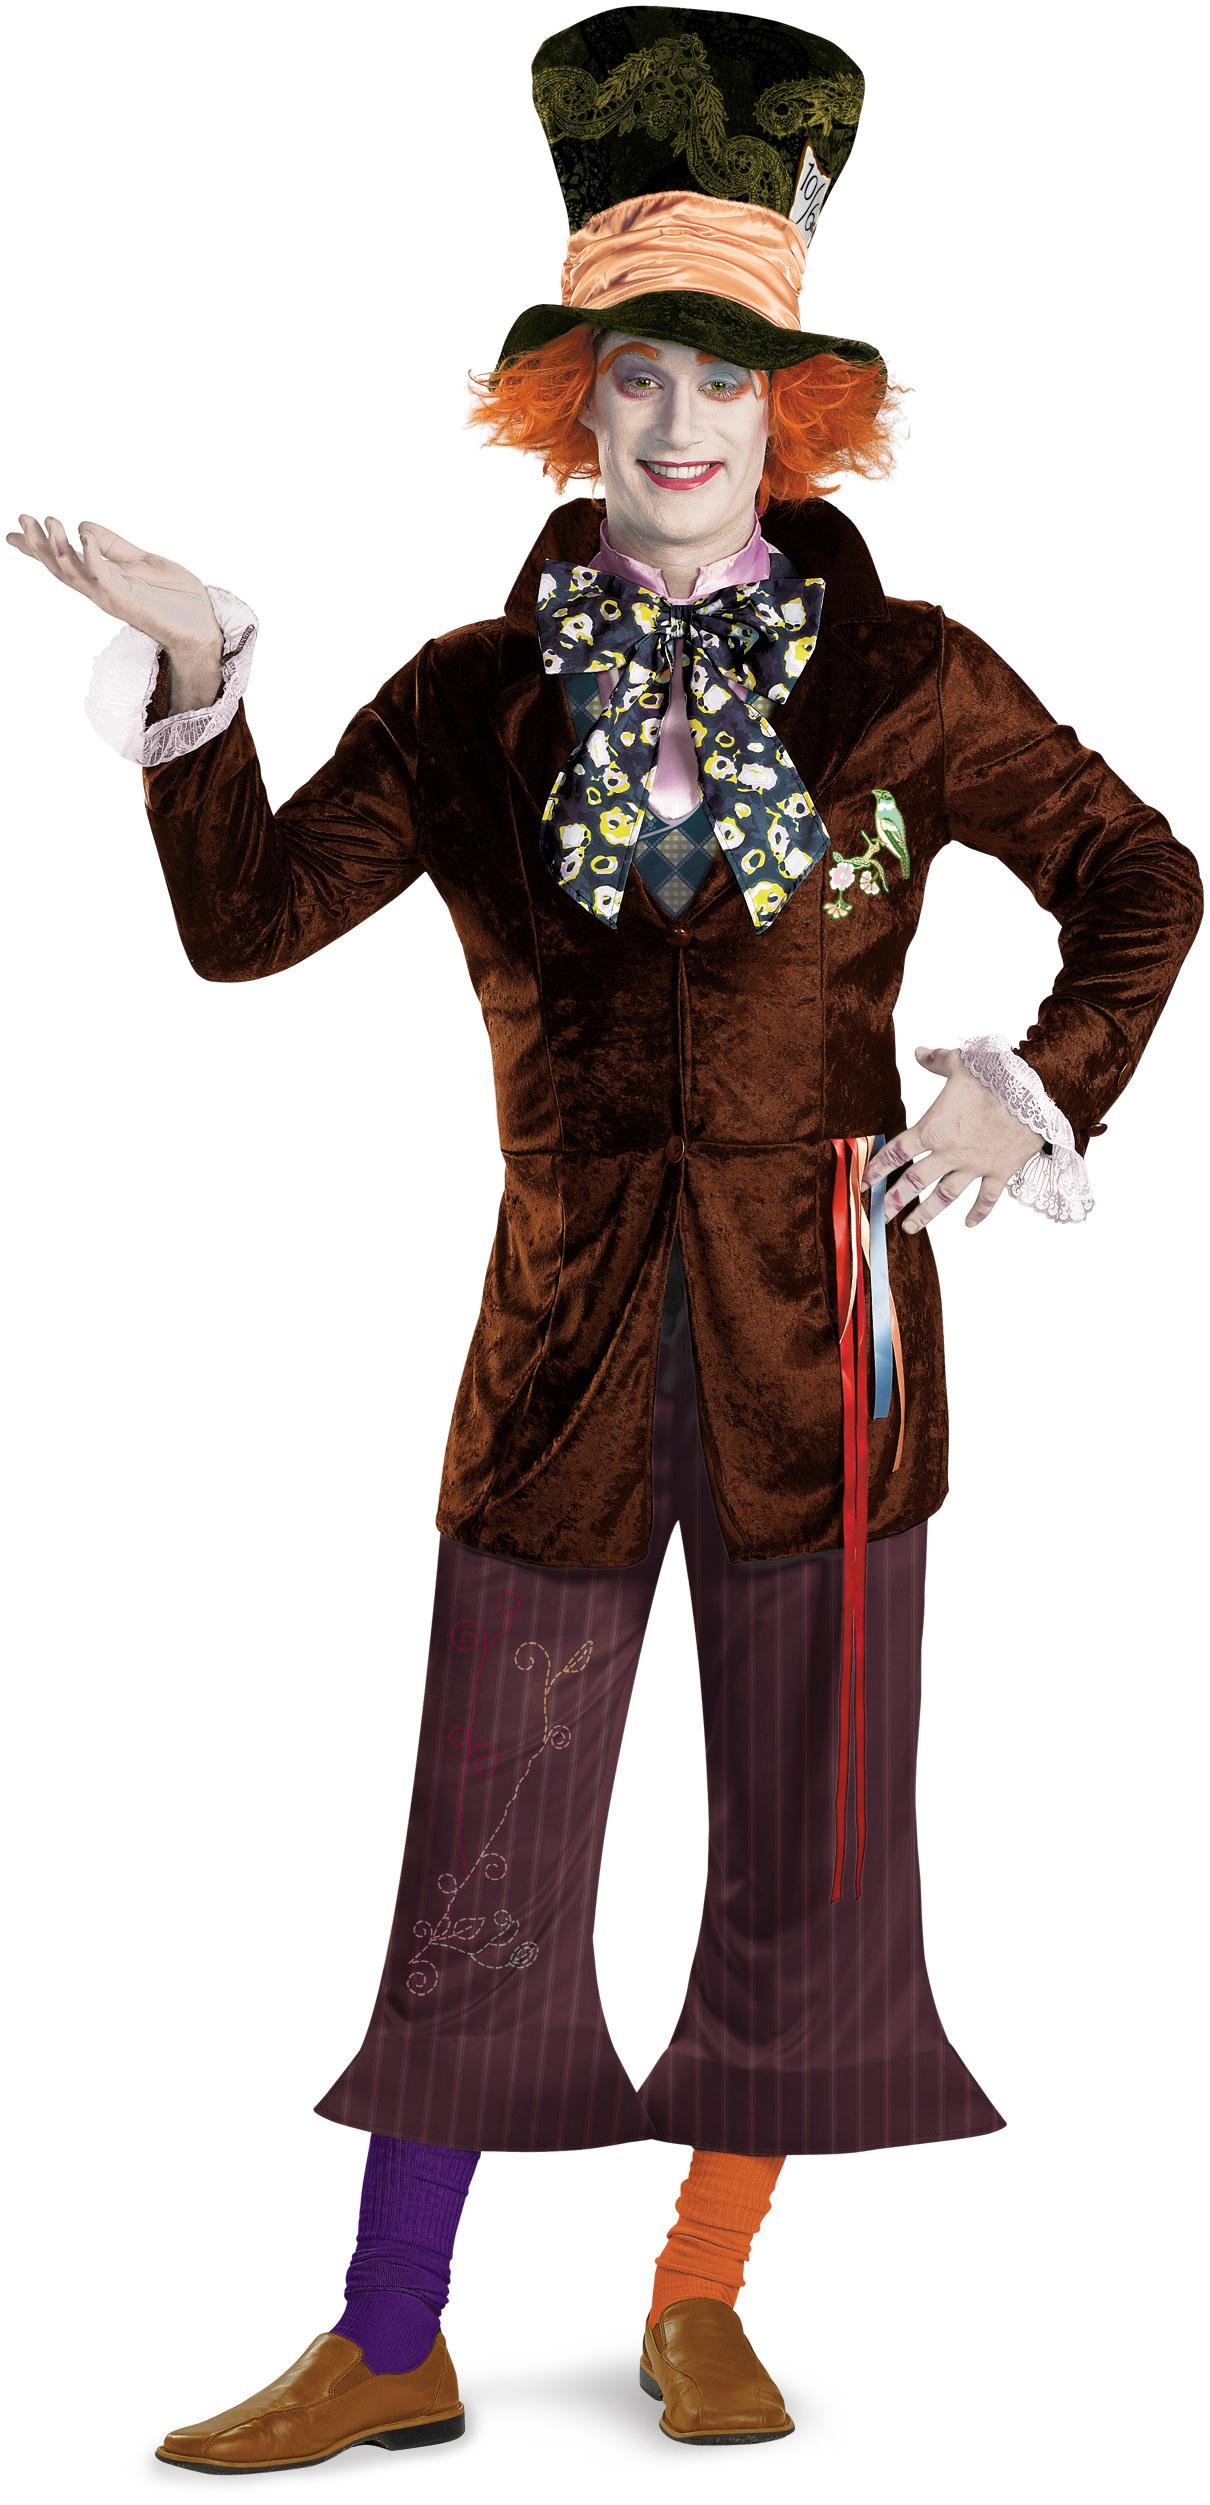 alice in wonderland movie prestige mad hatter adult costume buycostumescom - Mad Hatter Halloween Costume For Kids